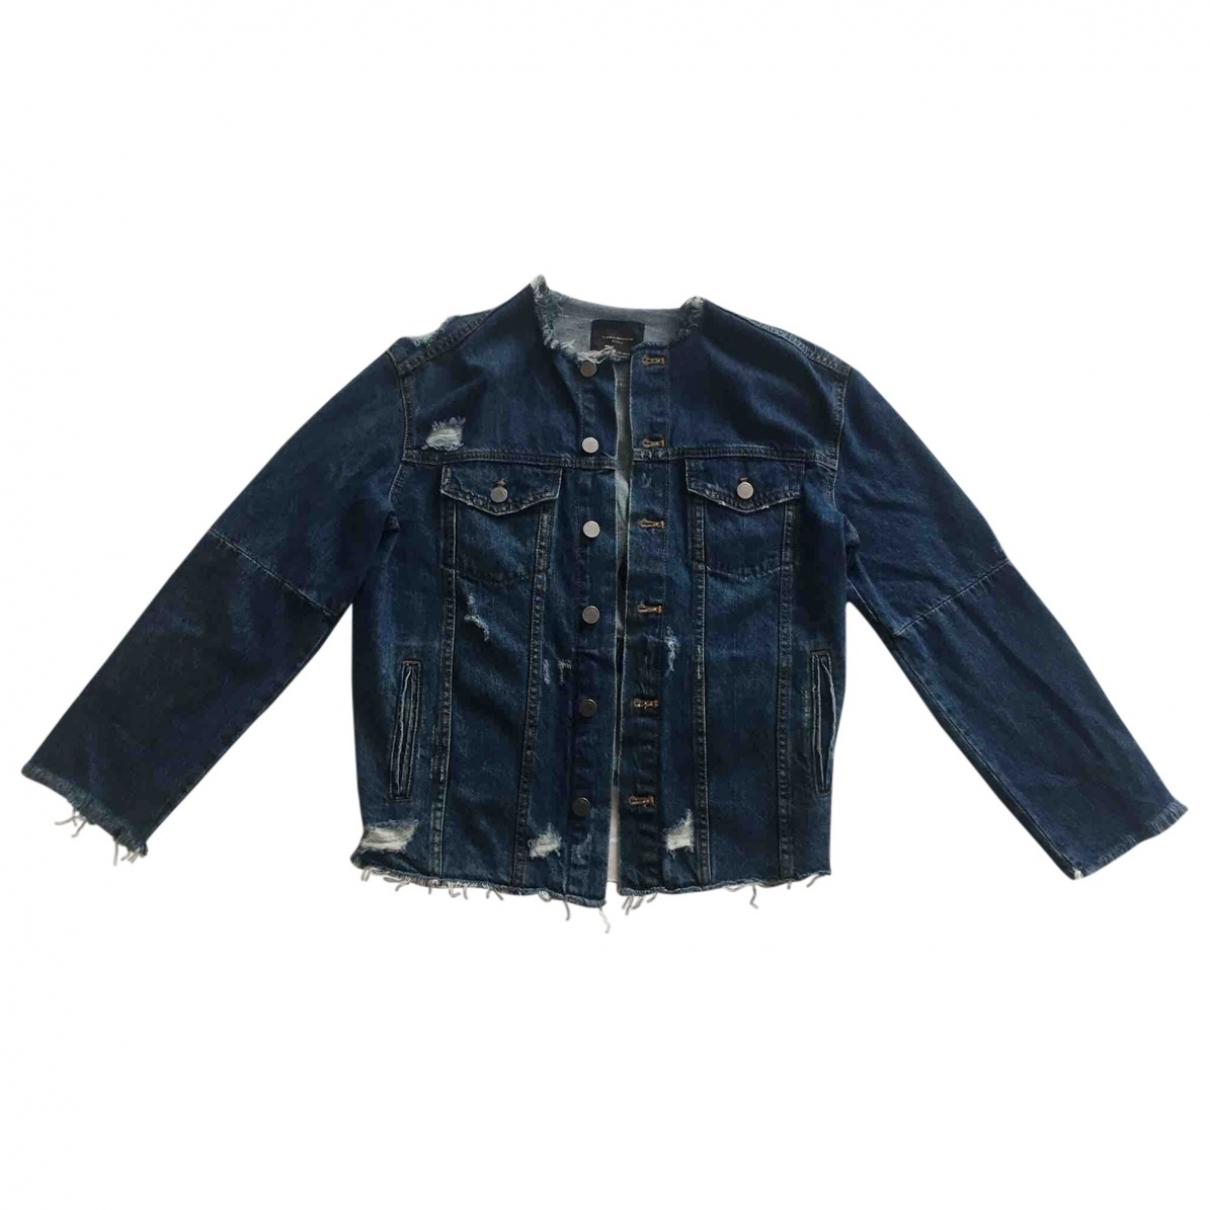 Zara - Manteau   pour femme en denim - bleu